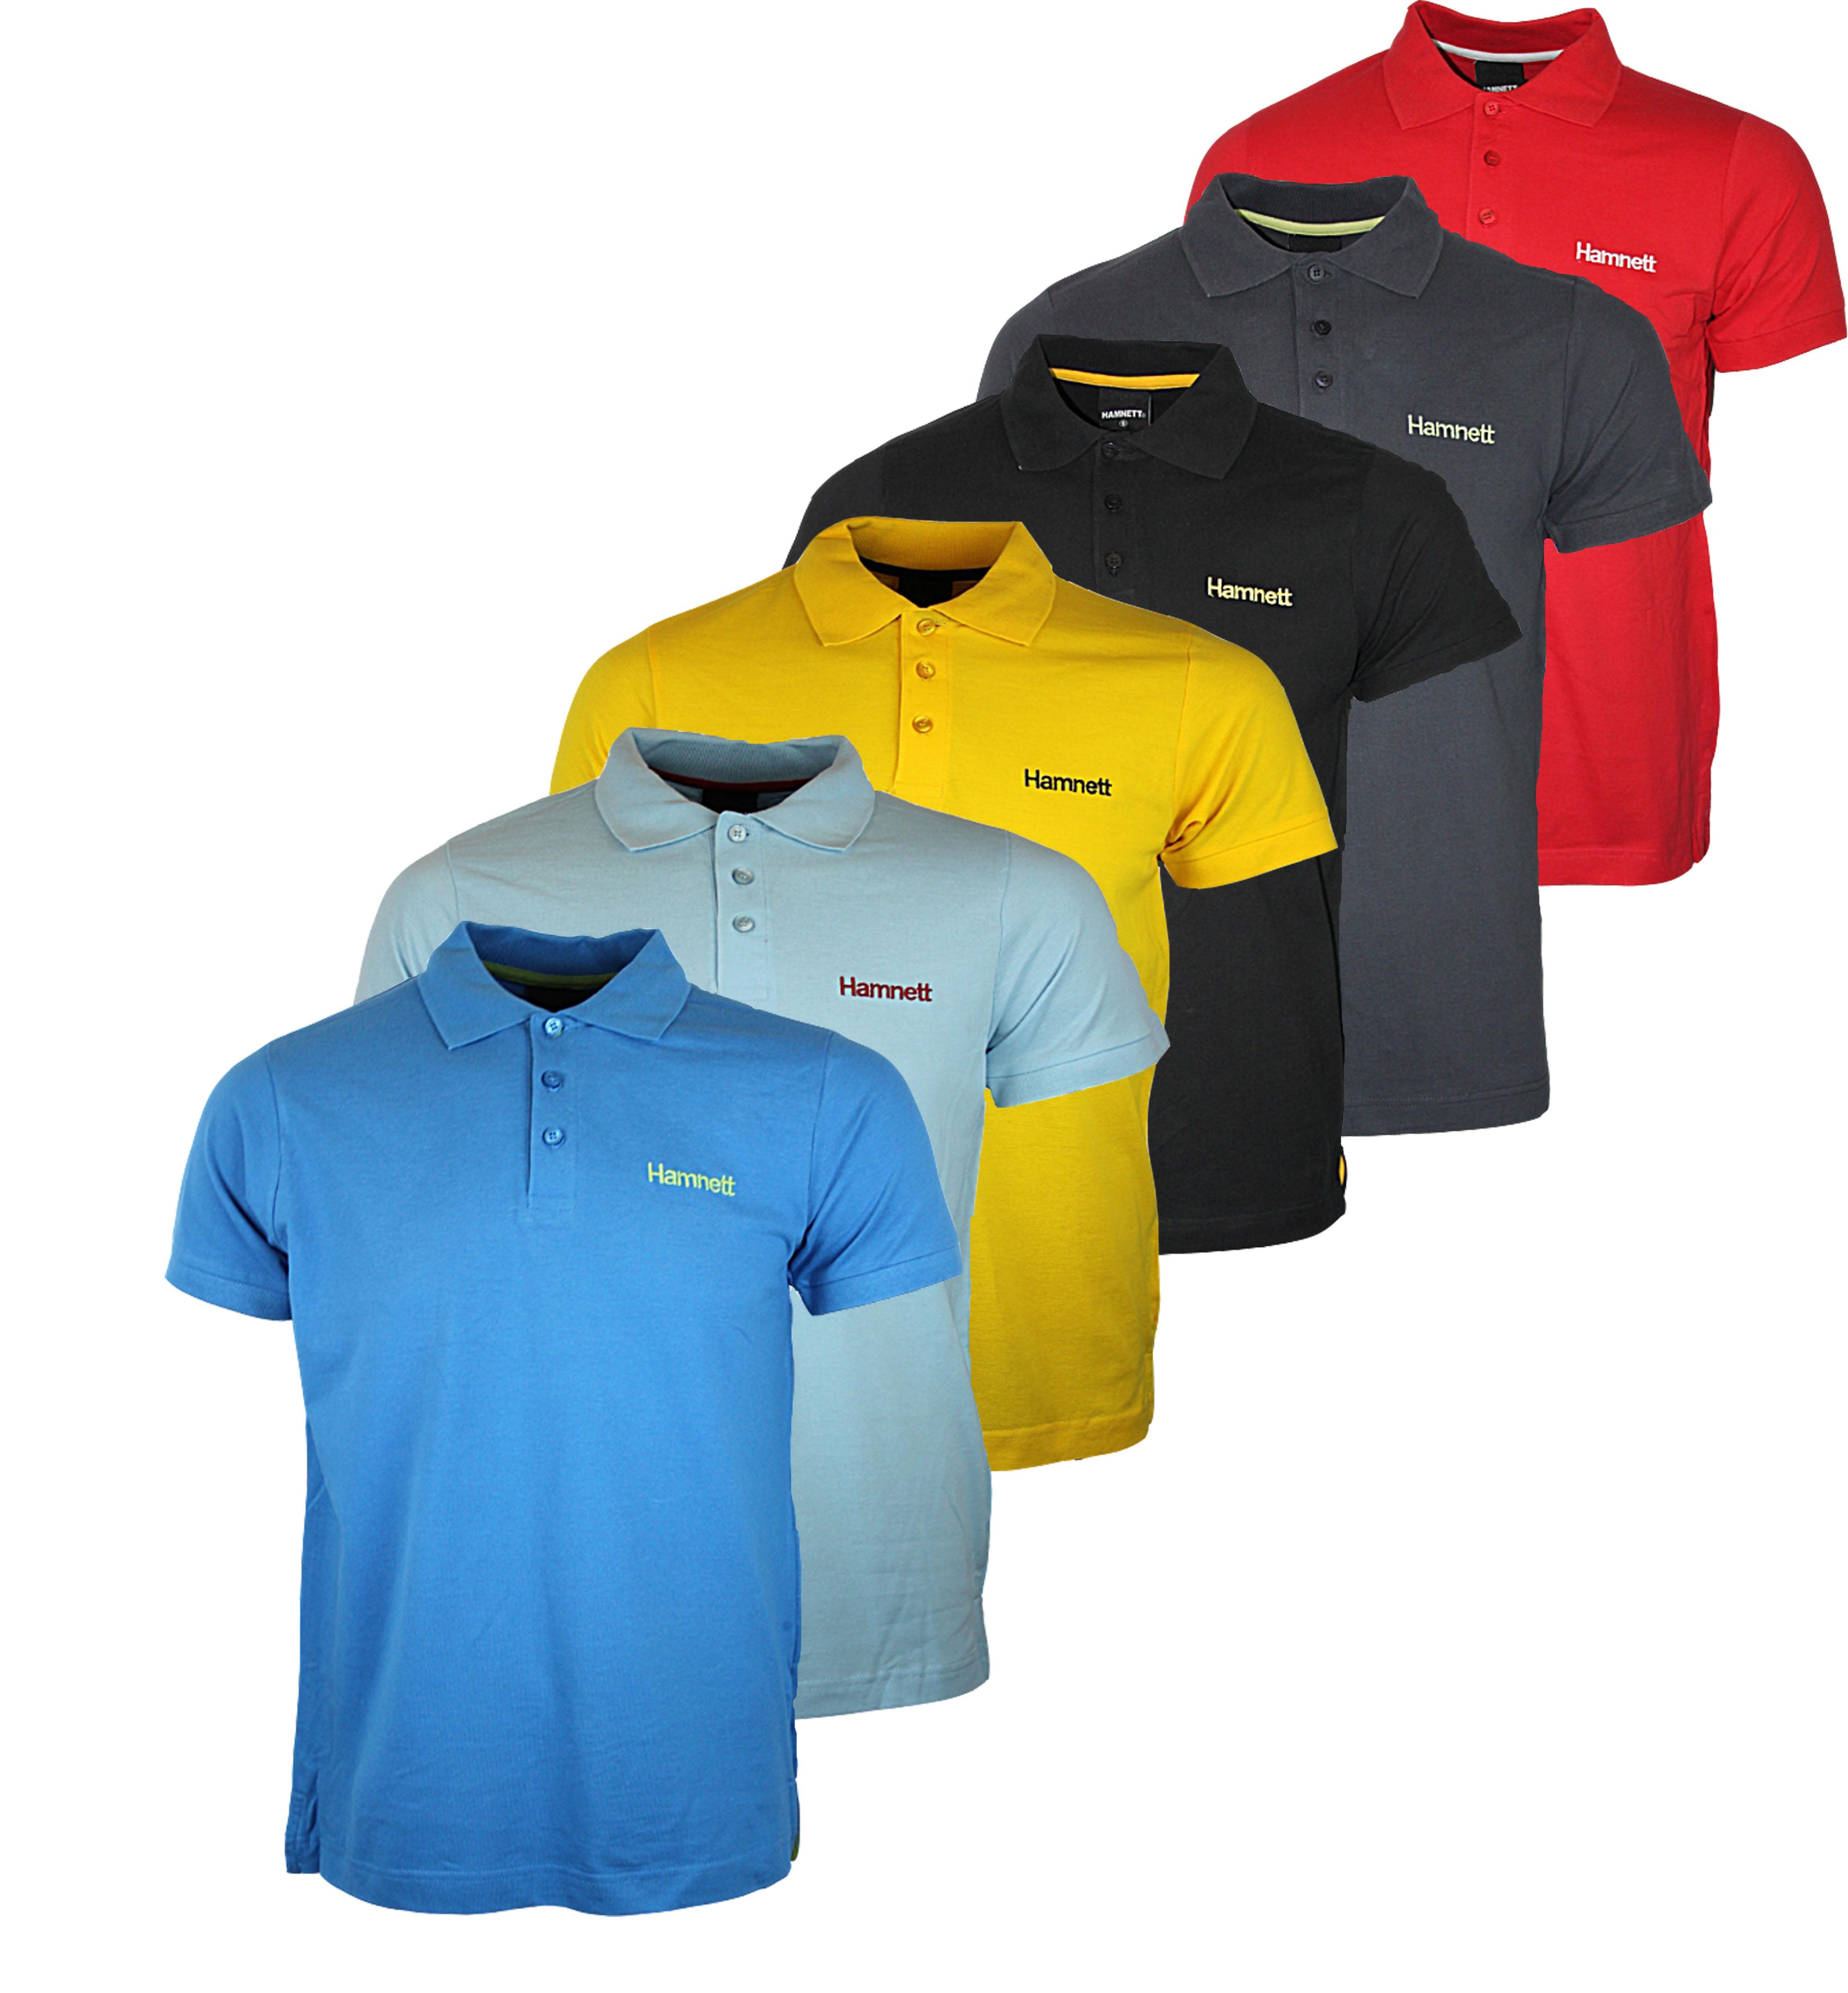 Design t shirt uk - New Mens Hamnett Gold H707627th Designer Polo Neck T Shirt Top Sizes S Xxl